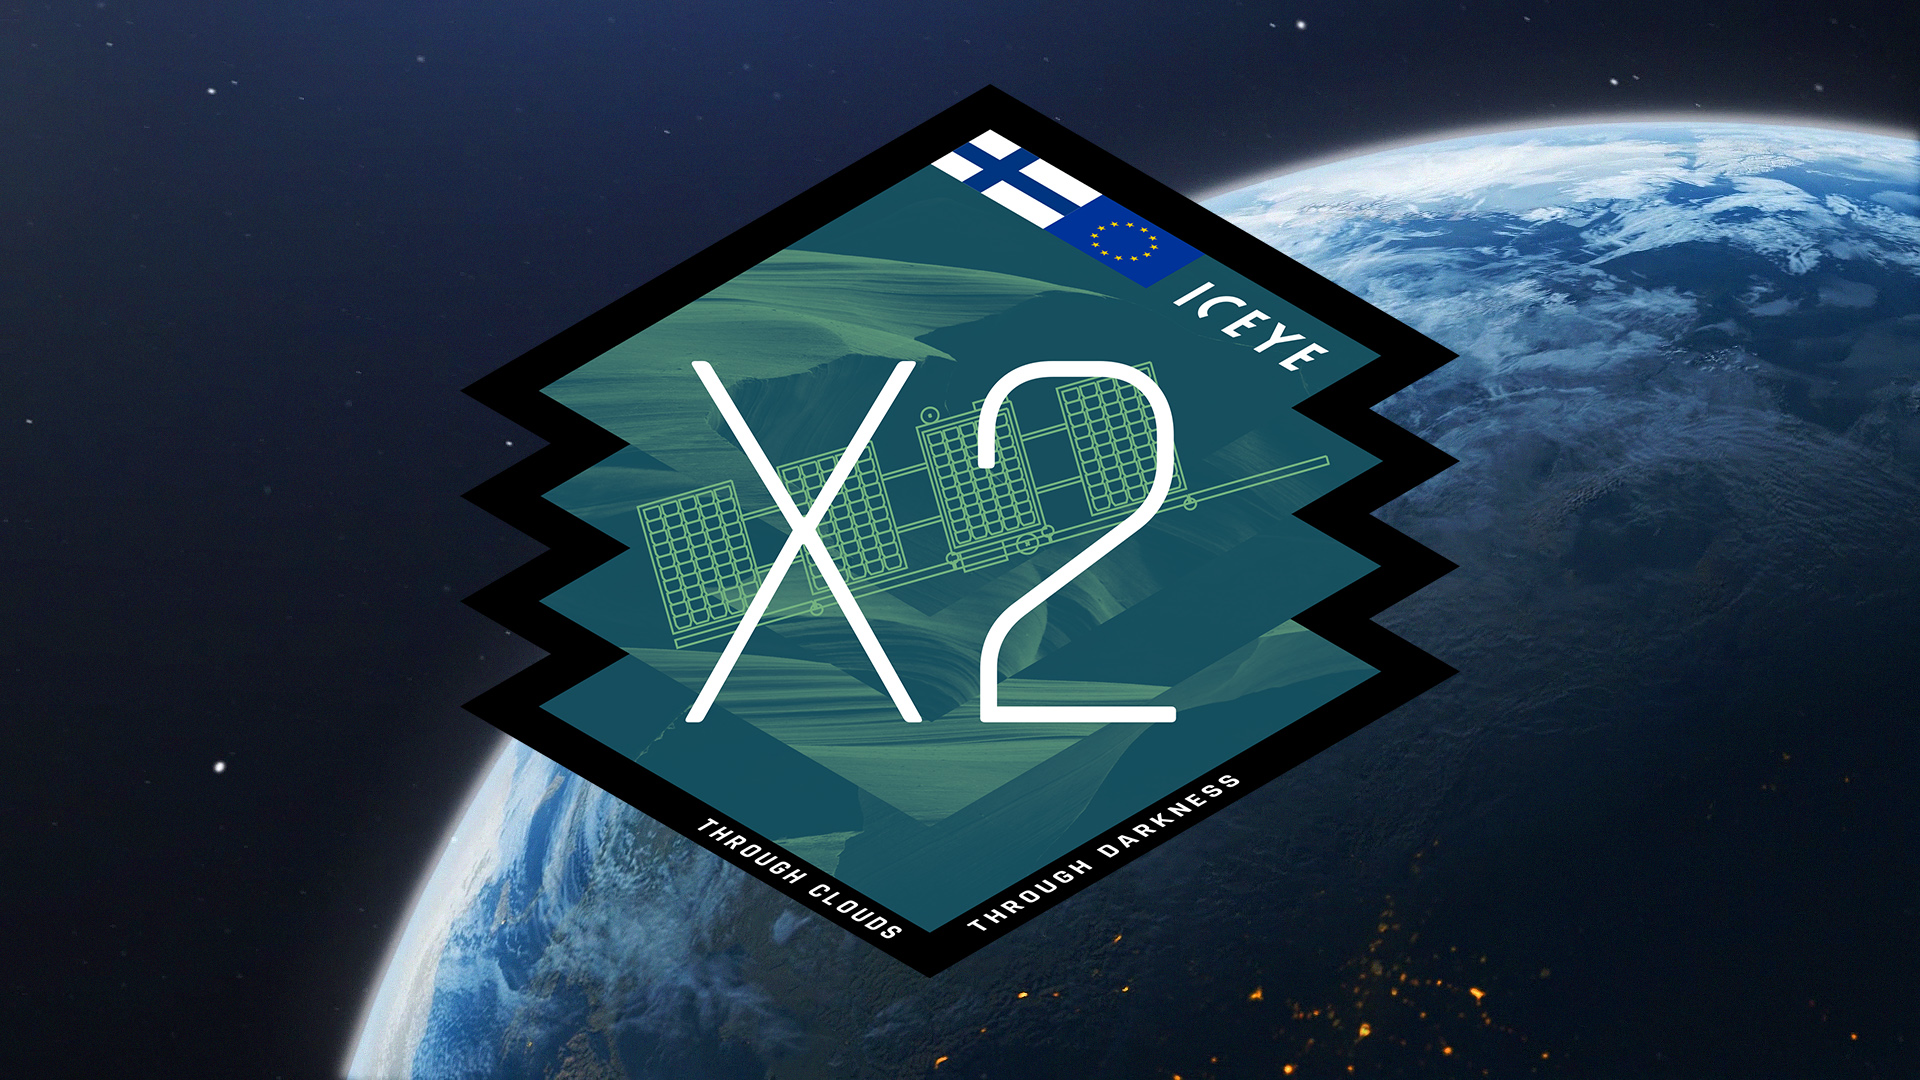 ICEYE-X2-concept-art-2-1